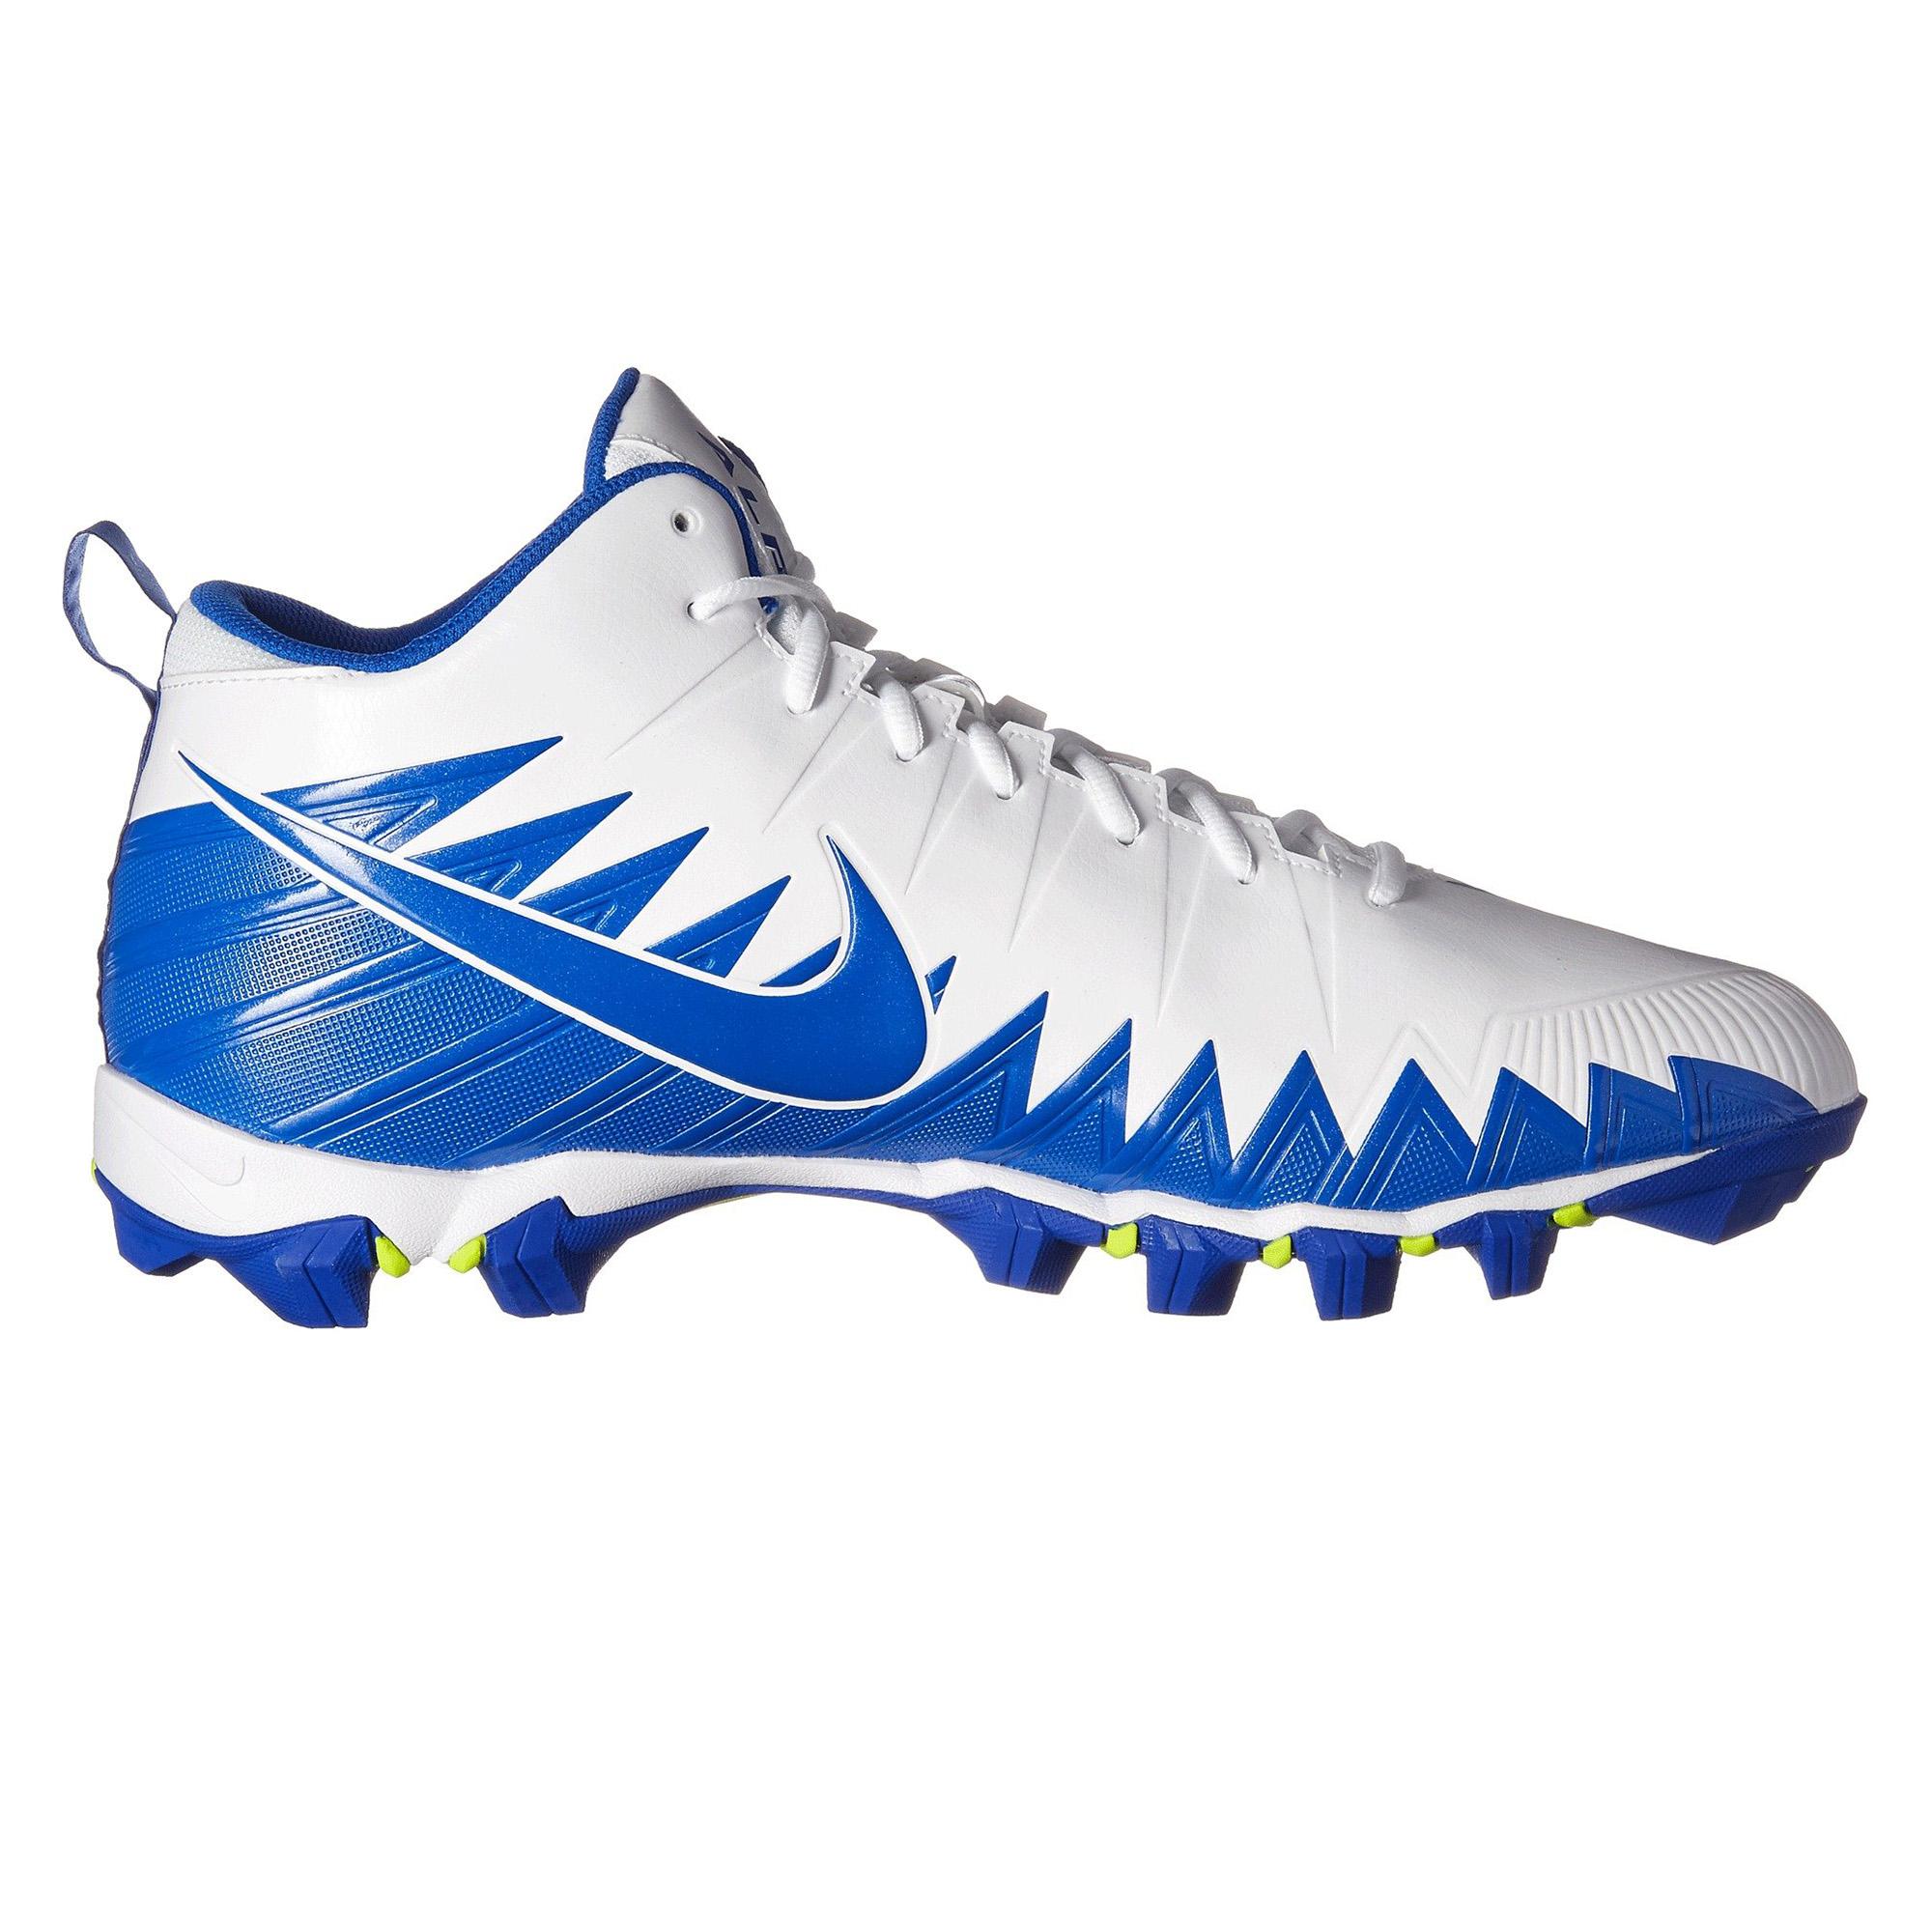 wholesale dealer 1b055 7a779 Nike-Alpha-Menace-Shark-American-Footballschuhe-verschiedene-Farben  Indexbild